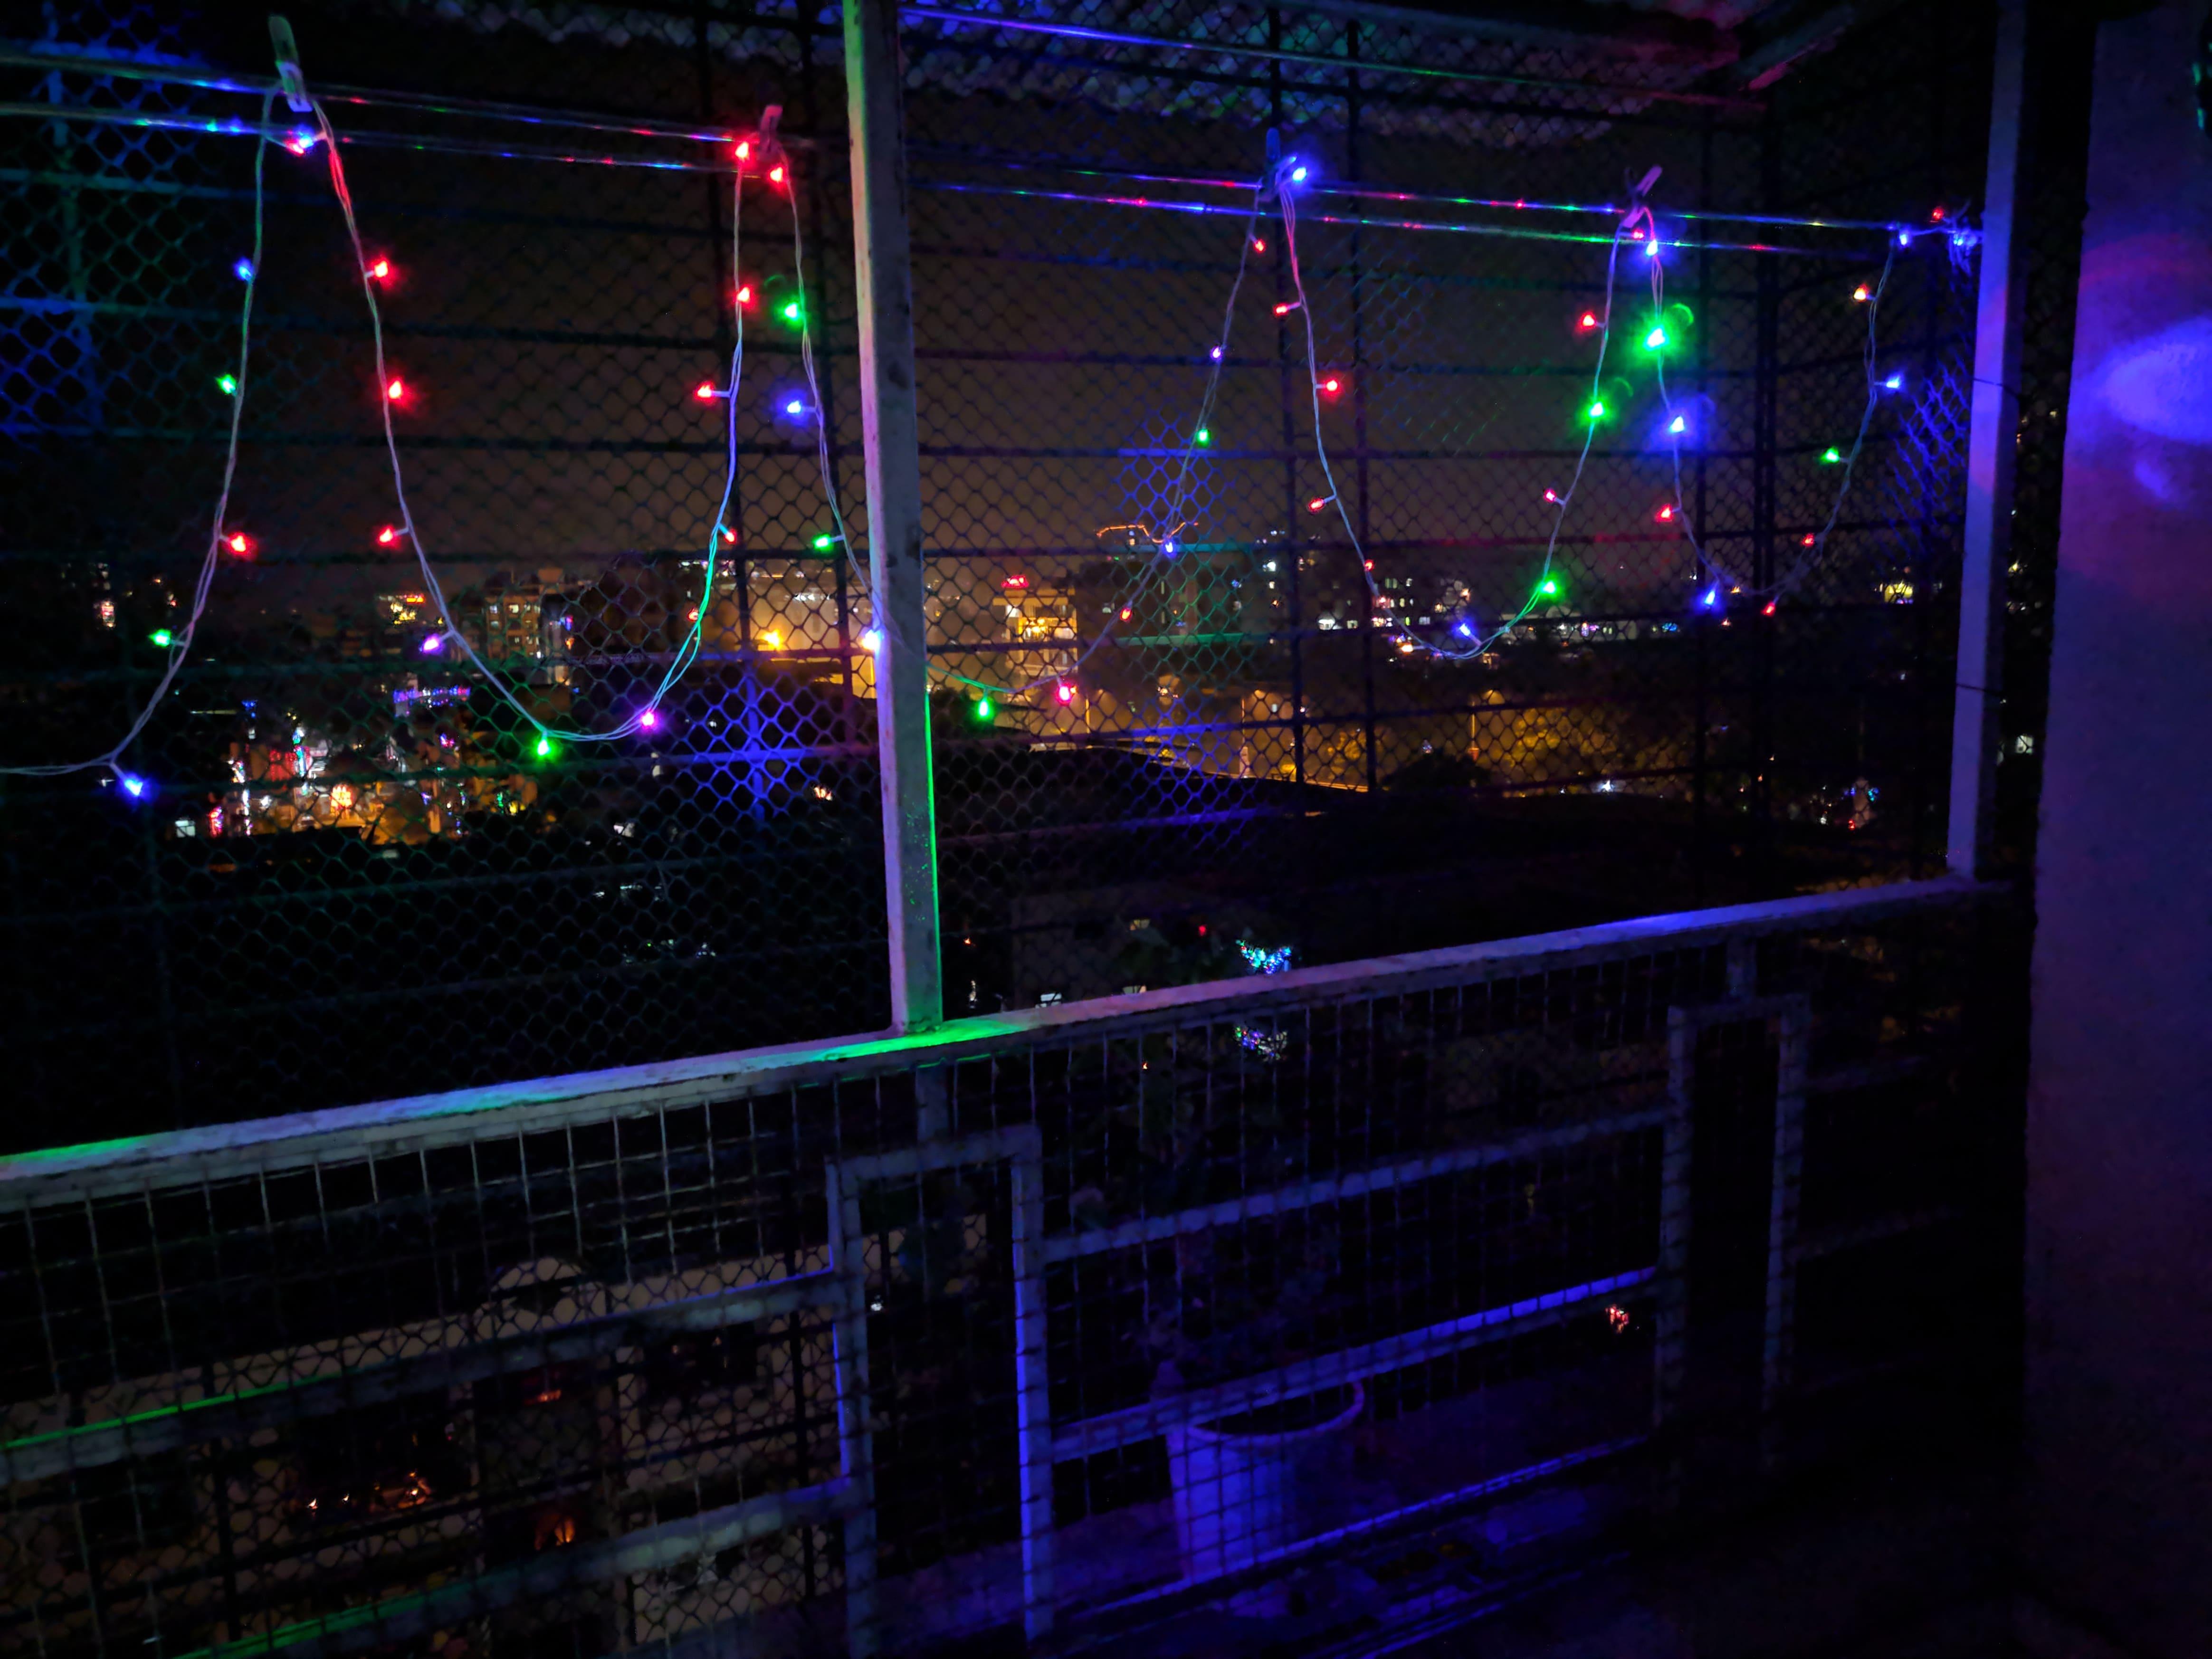 Night Sight Camera photos